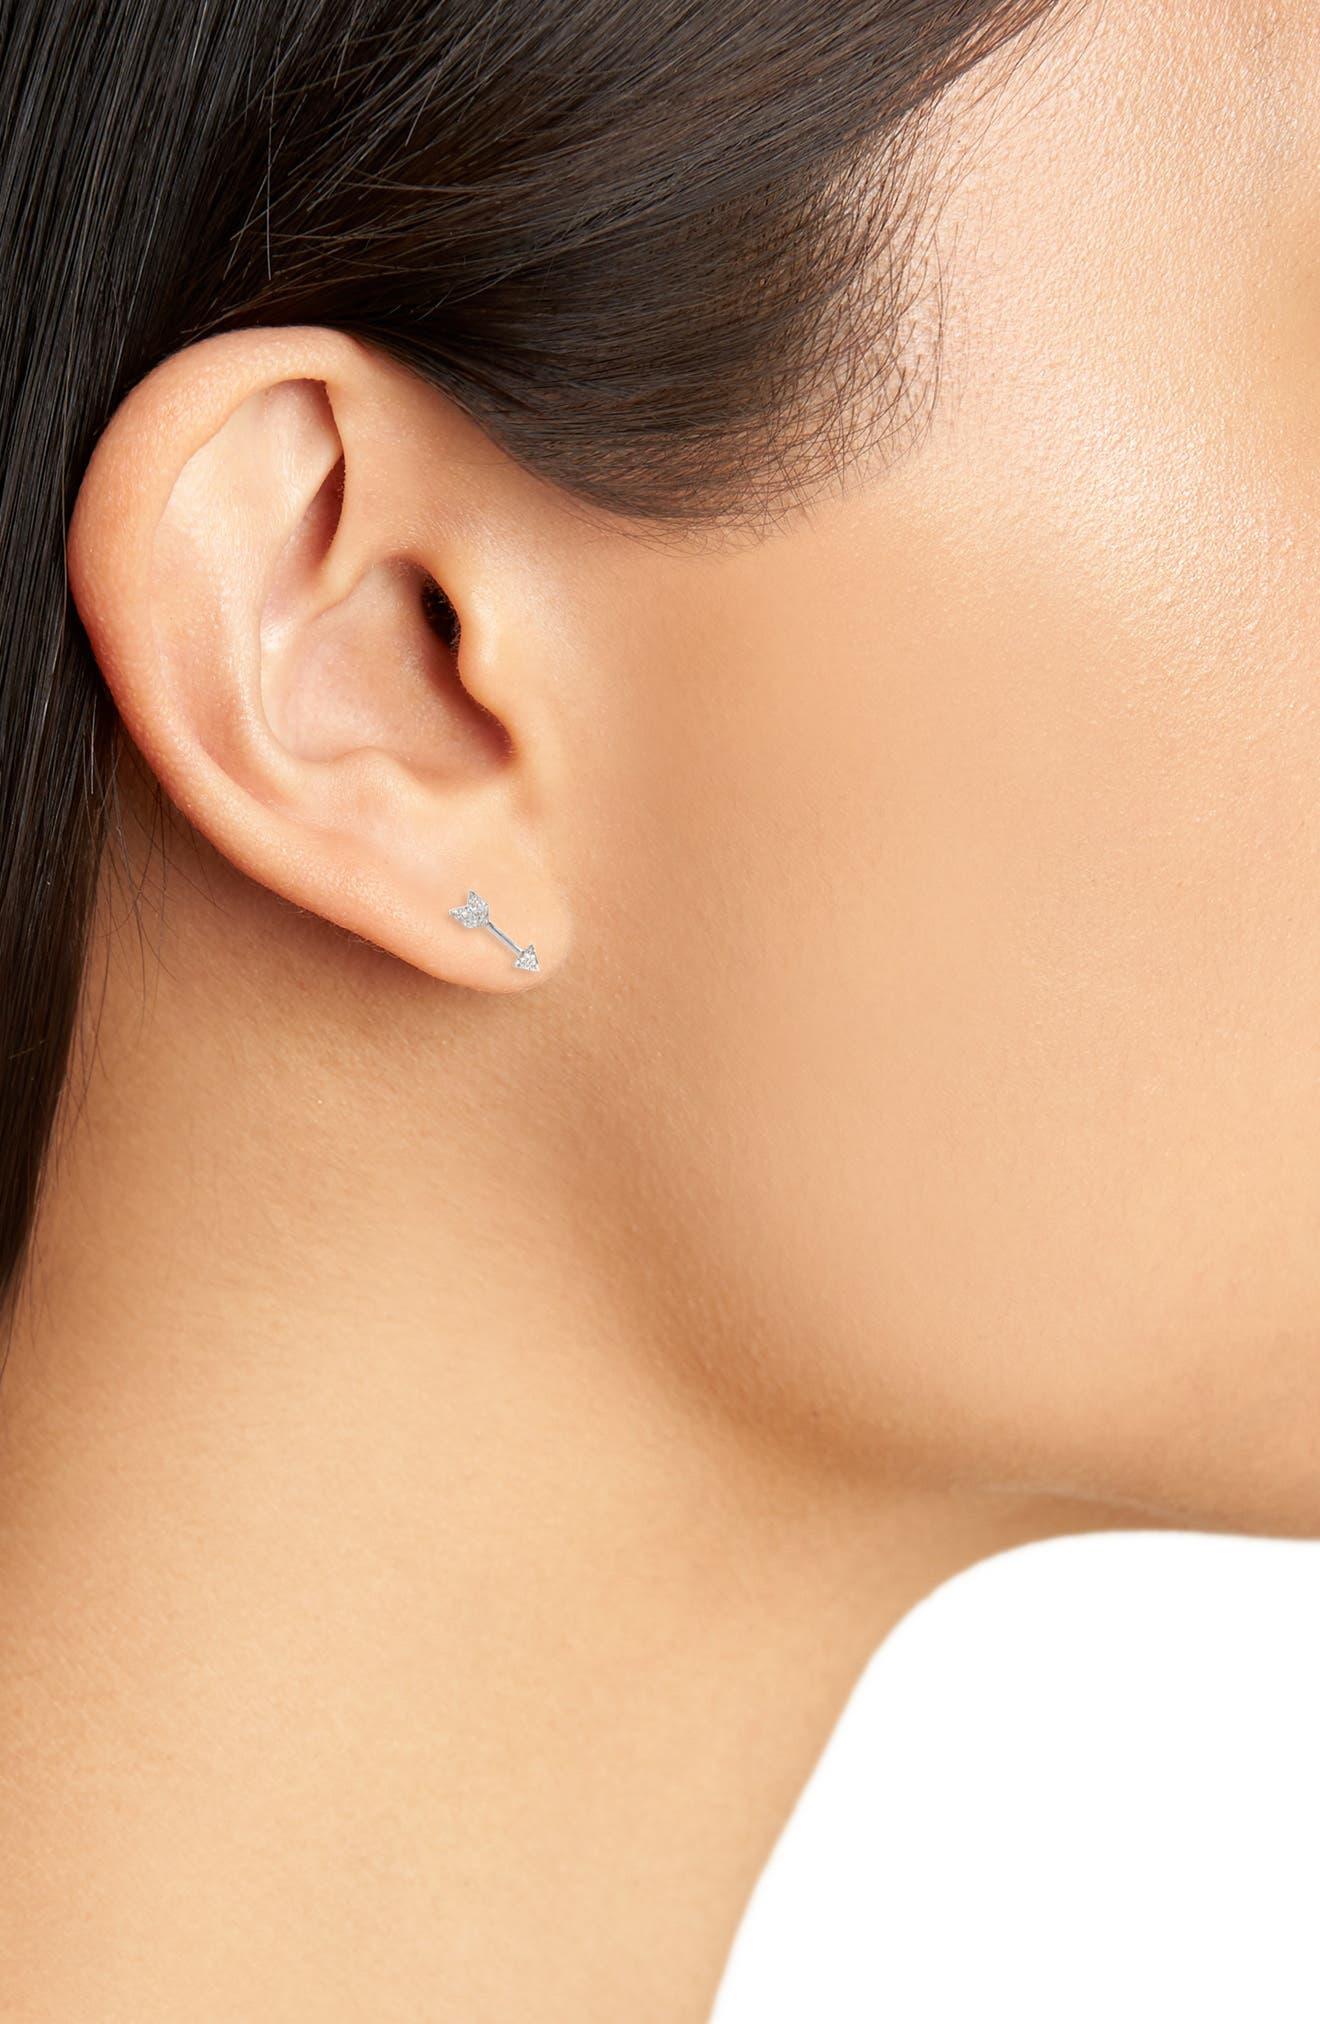 Diamond Arrow Stud Earrings,                             Alternate thumbnail 2, color,                             WHITE GOLD